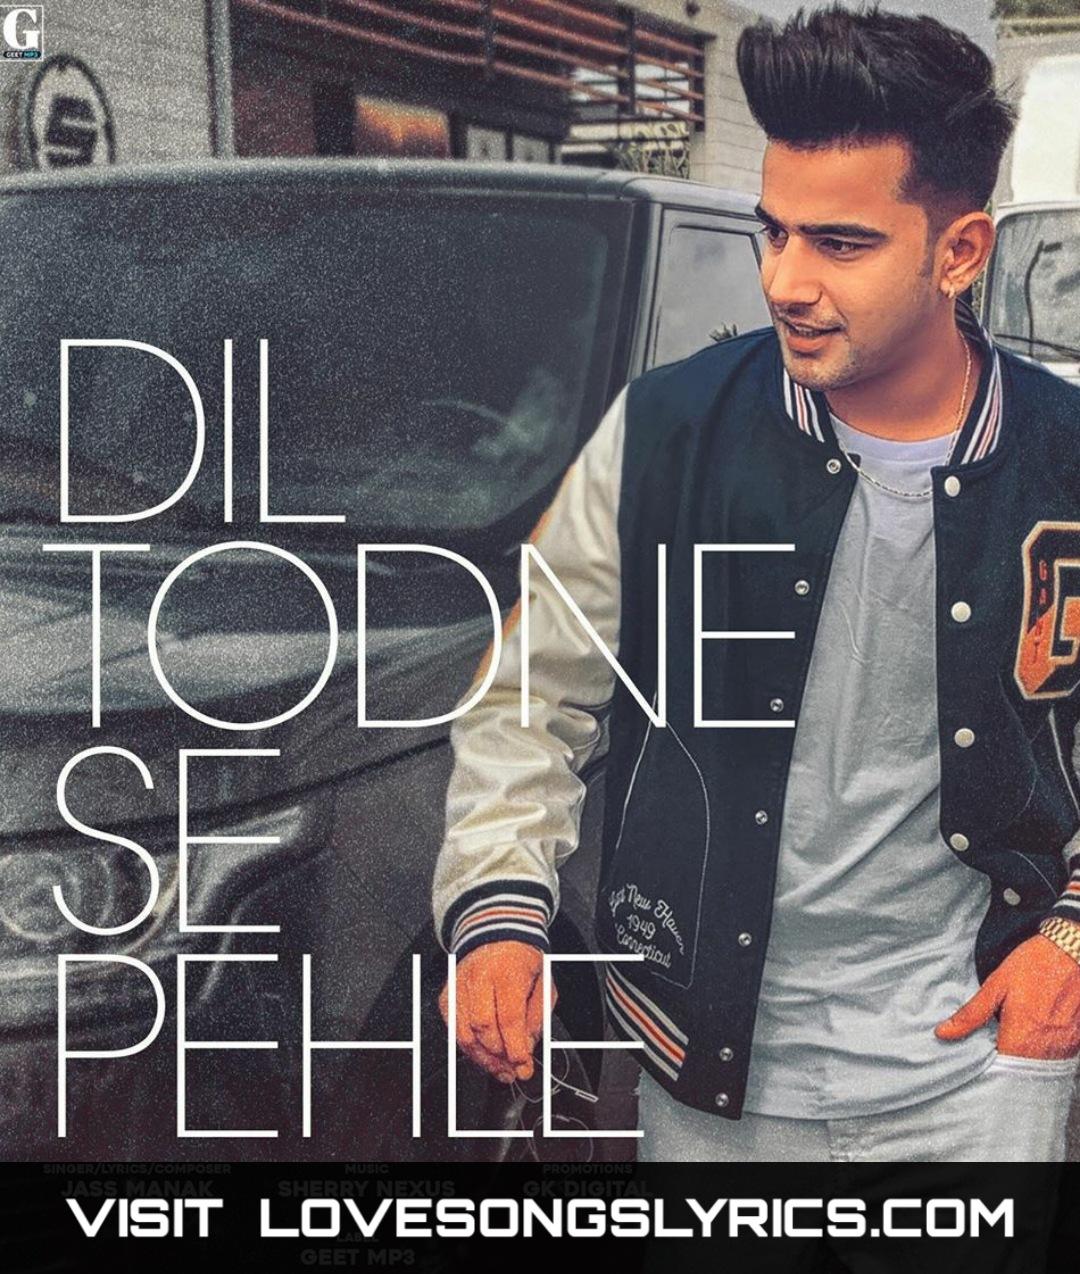 Dil Todne Se Phle Lyrics In Hindi